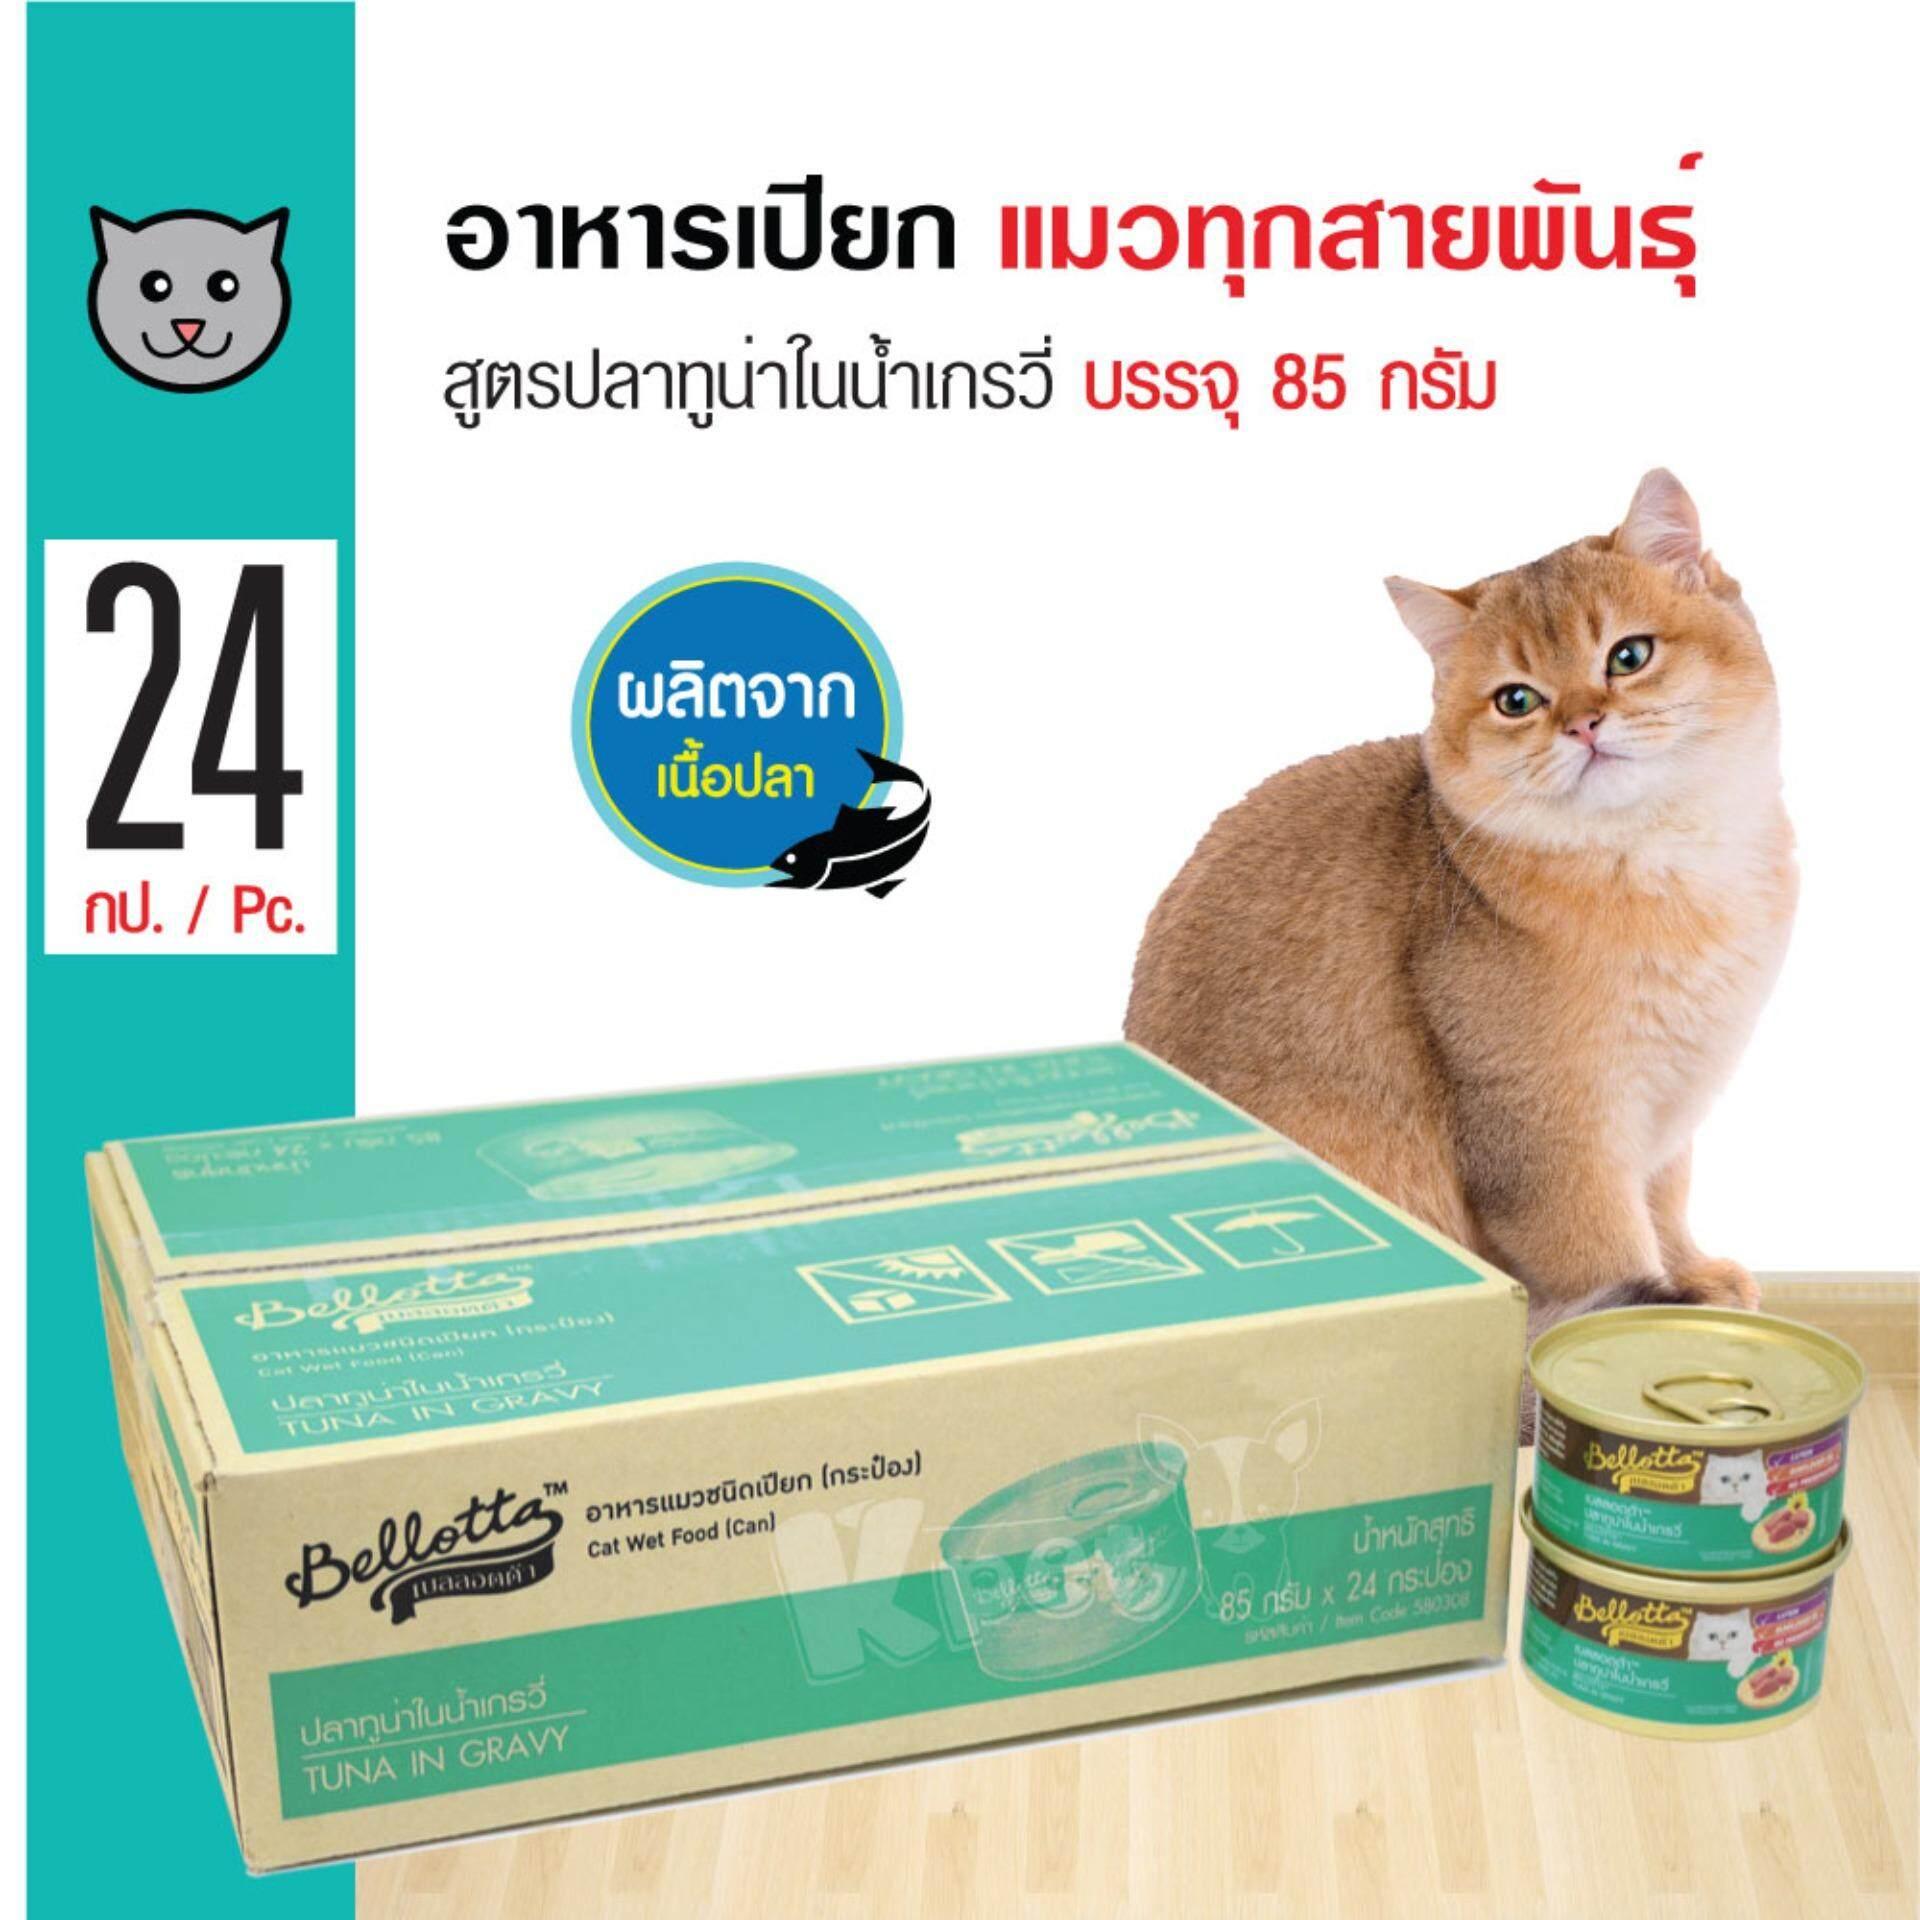 Bellotta Tuna In Gravy อาหารเปียกแมว รสปลาทูน่าในน้ำเกรวี่ สำหรับทุกสายพันธุ์ ขนาด 85 กรัม X 24 กระป๋อง By Kpet.